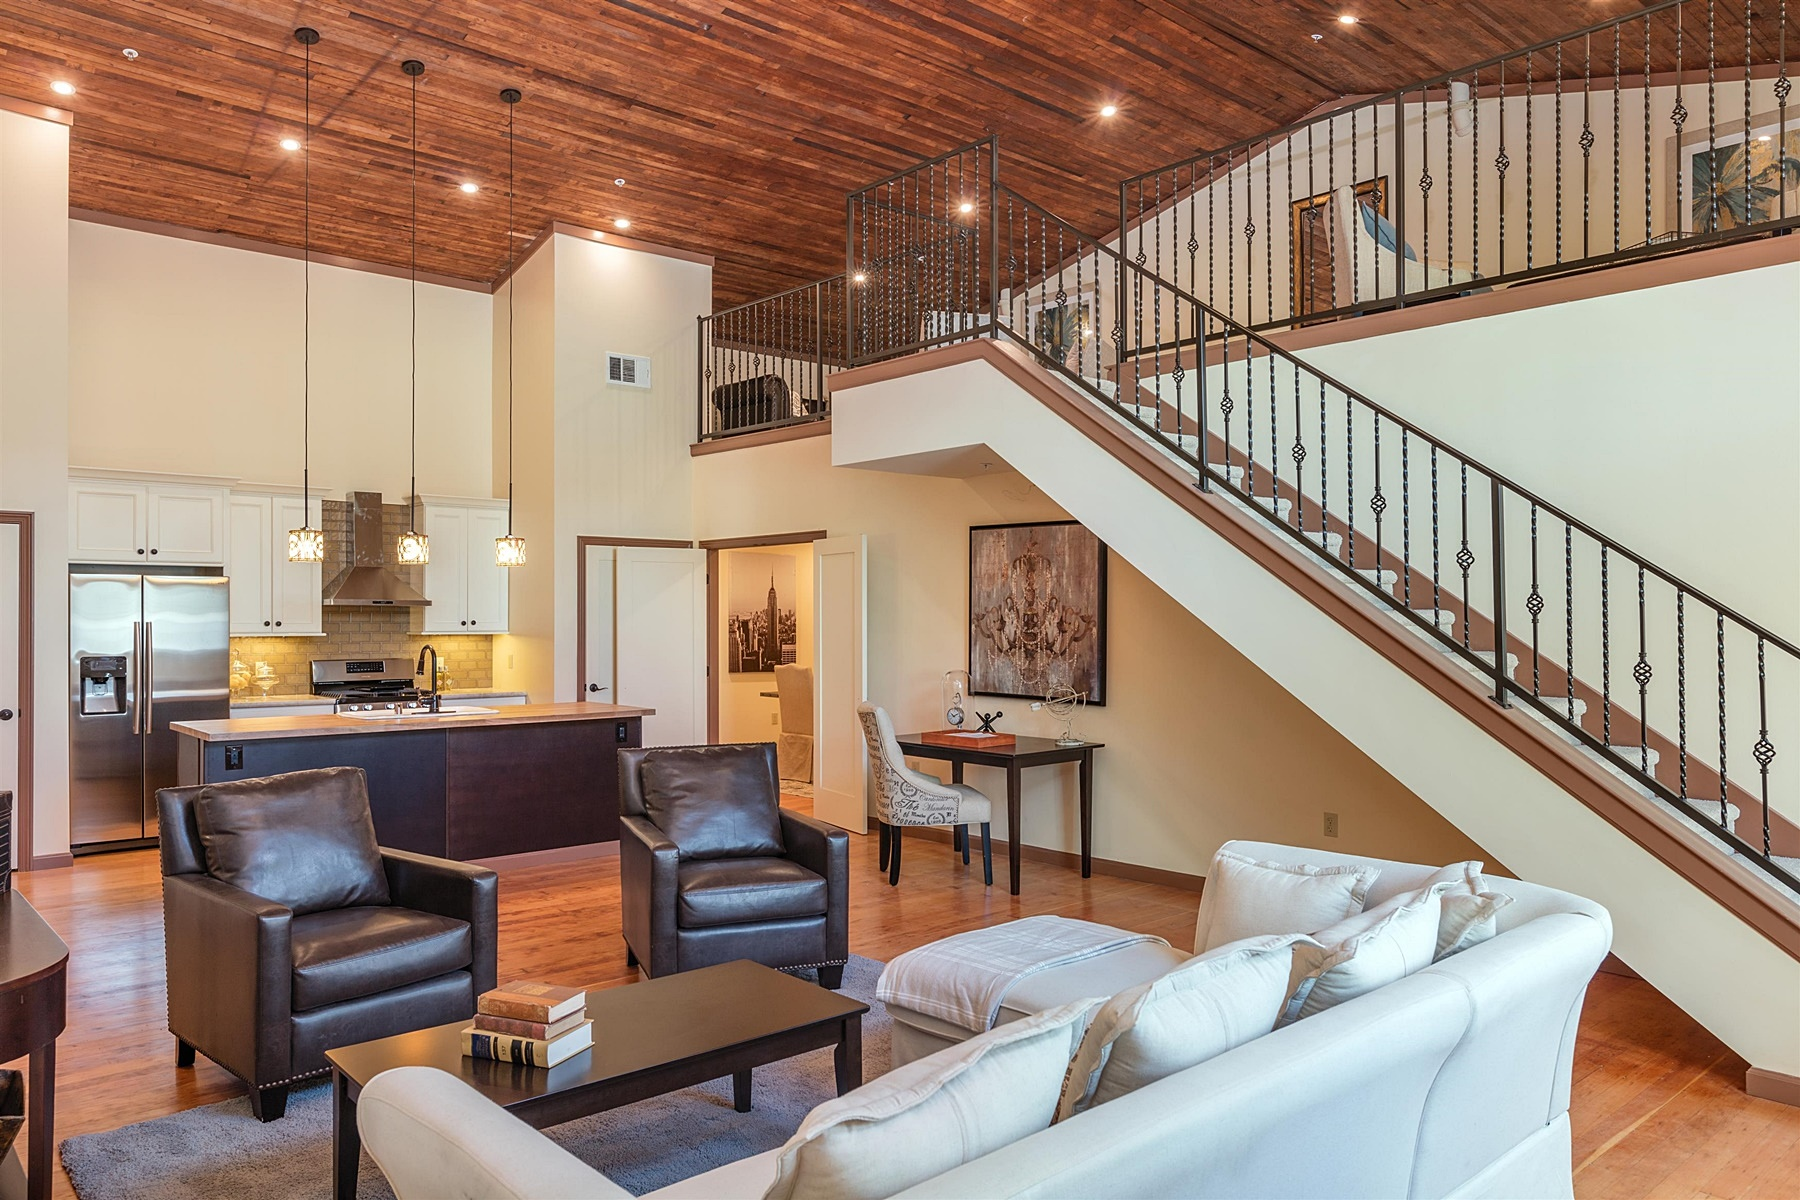 Condominium for Sale at The Sanctuary At Shattuck: New Luxury Condos In Bushrod 598 63rd Street #3 Oakland, California 94609 United States